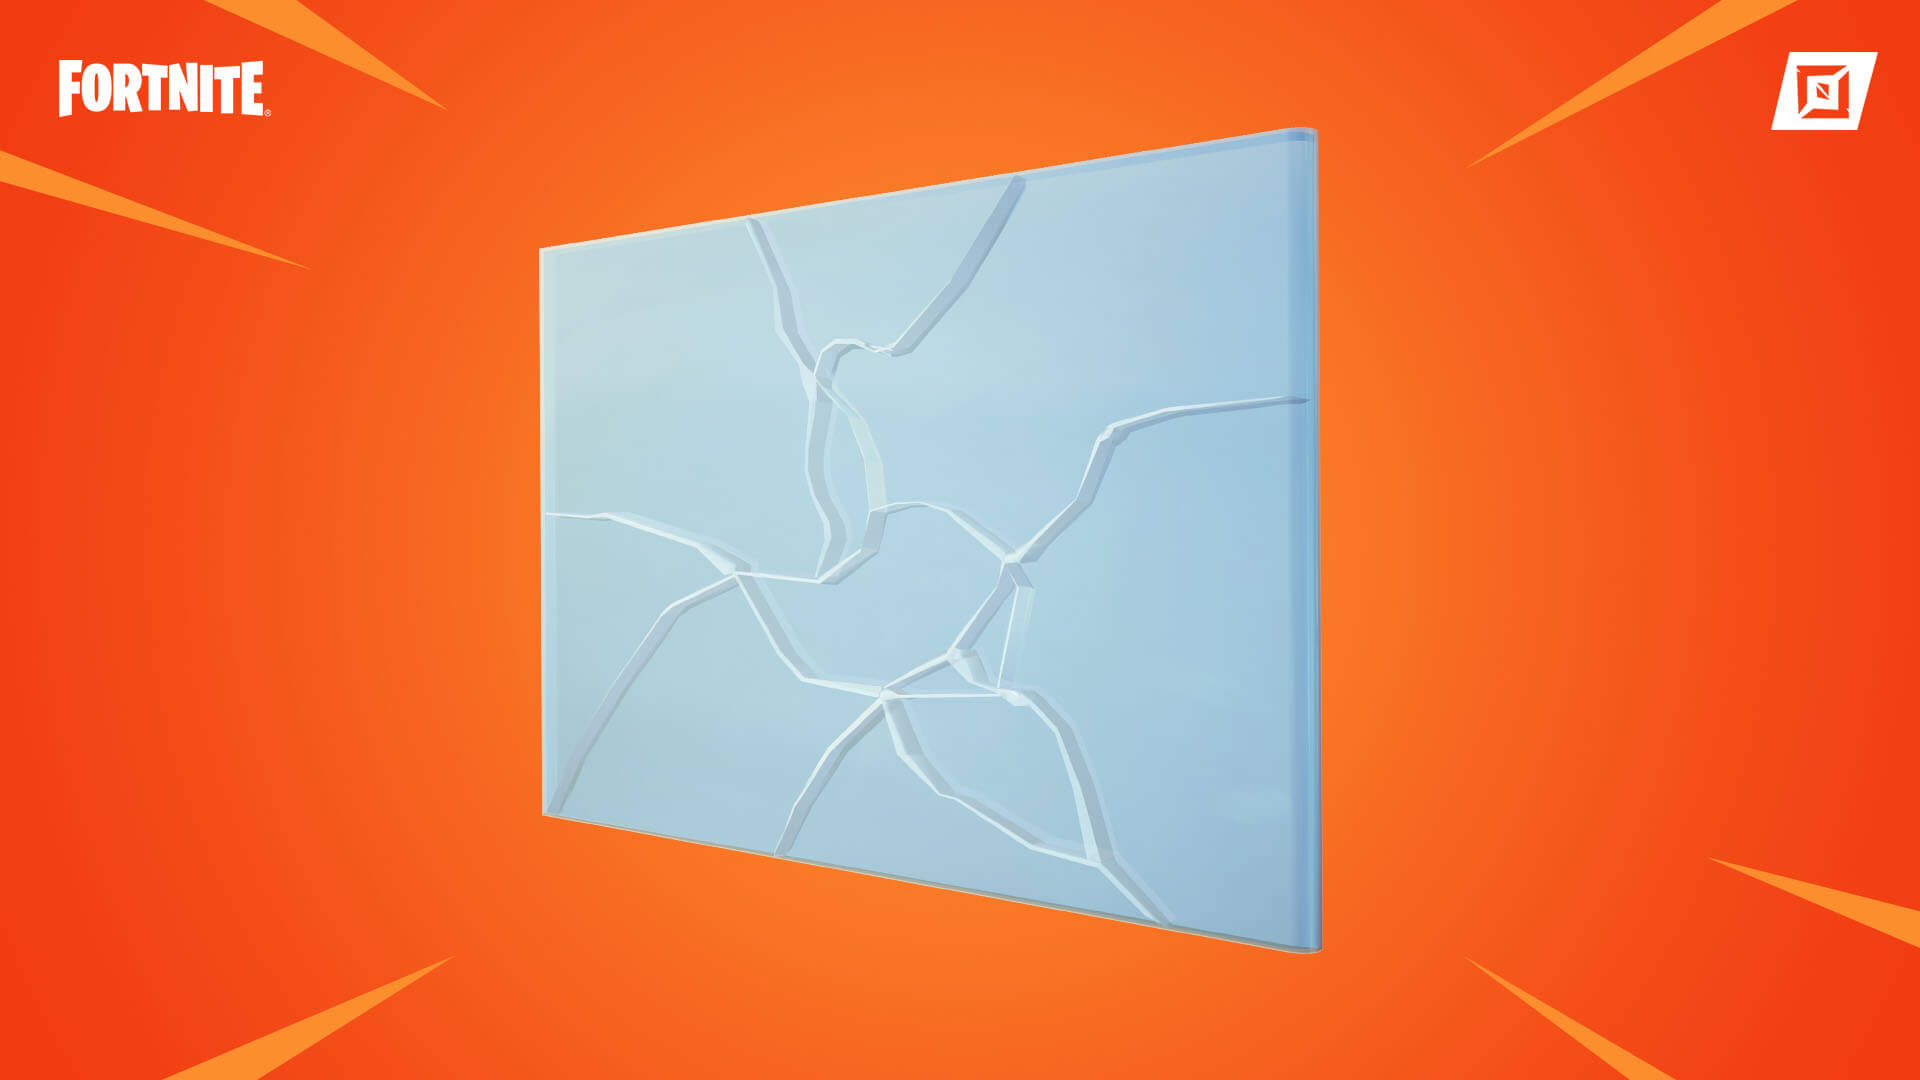 Fortnite Creative Glass Gallery